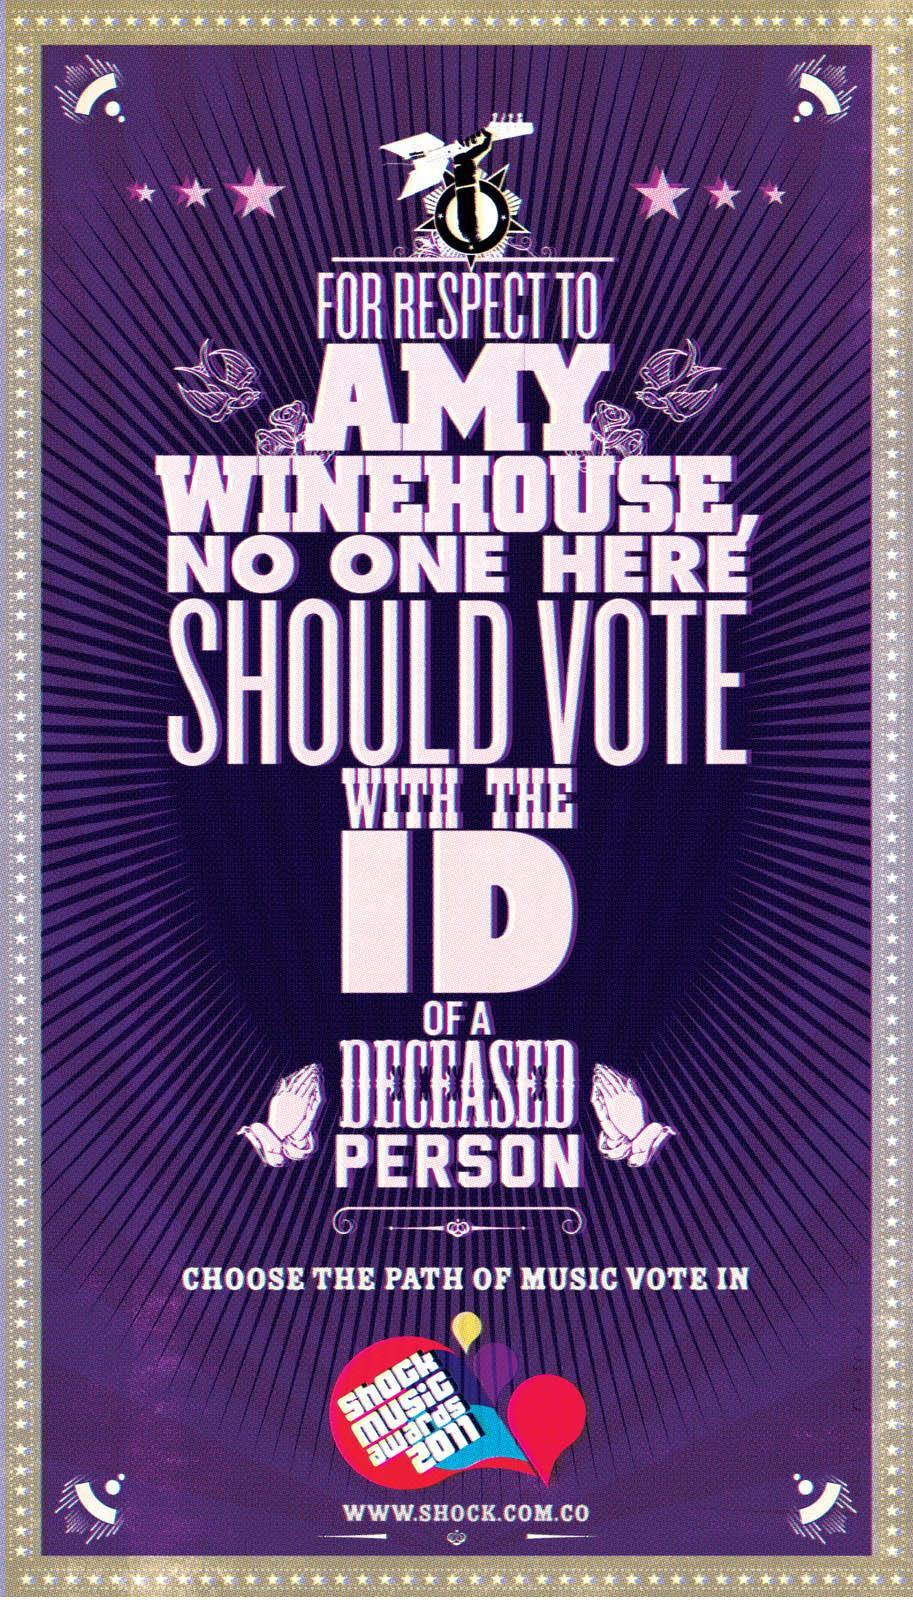 Shock Music Awards Print Ad -  Amy